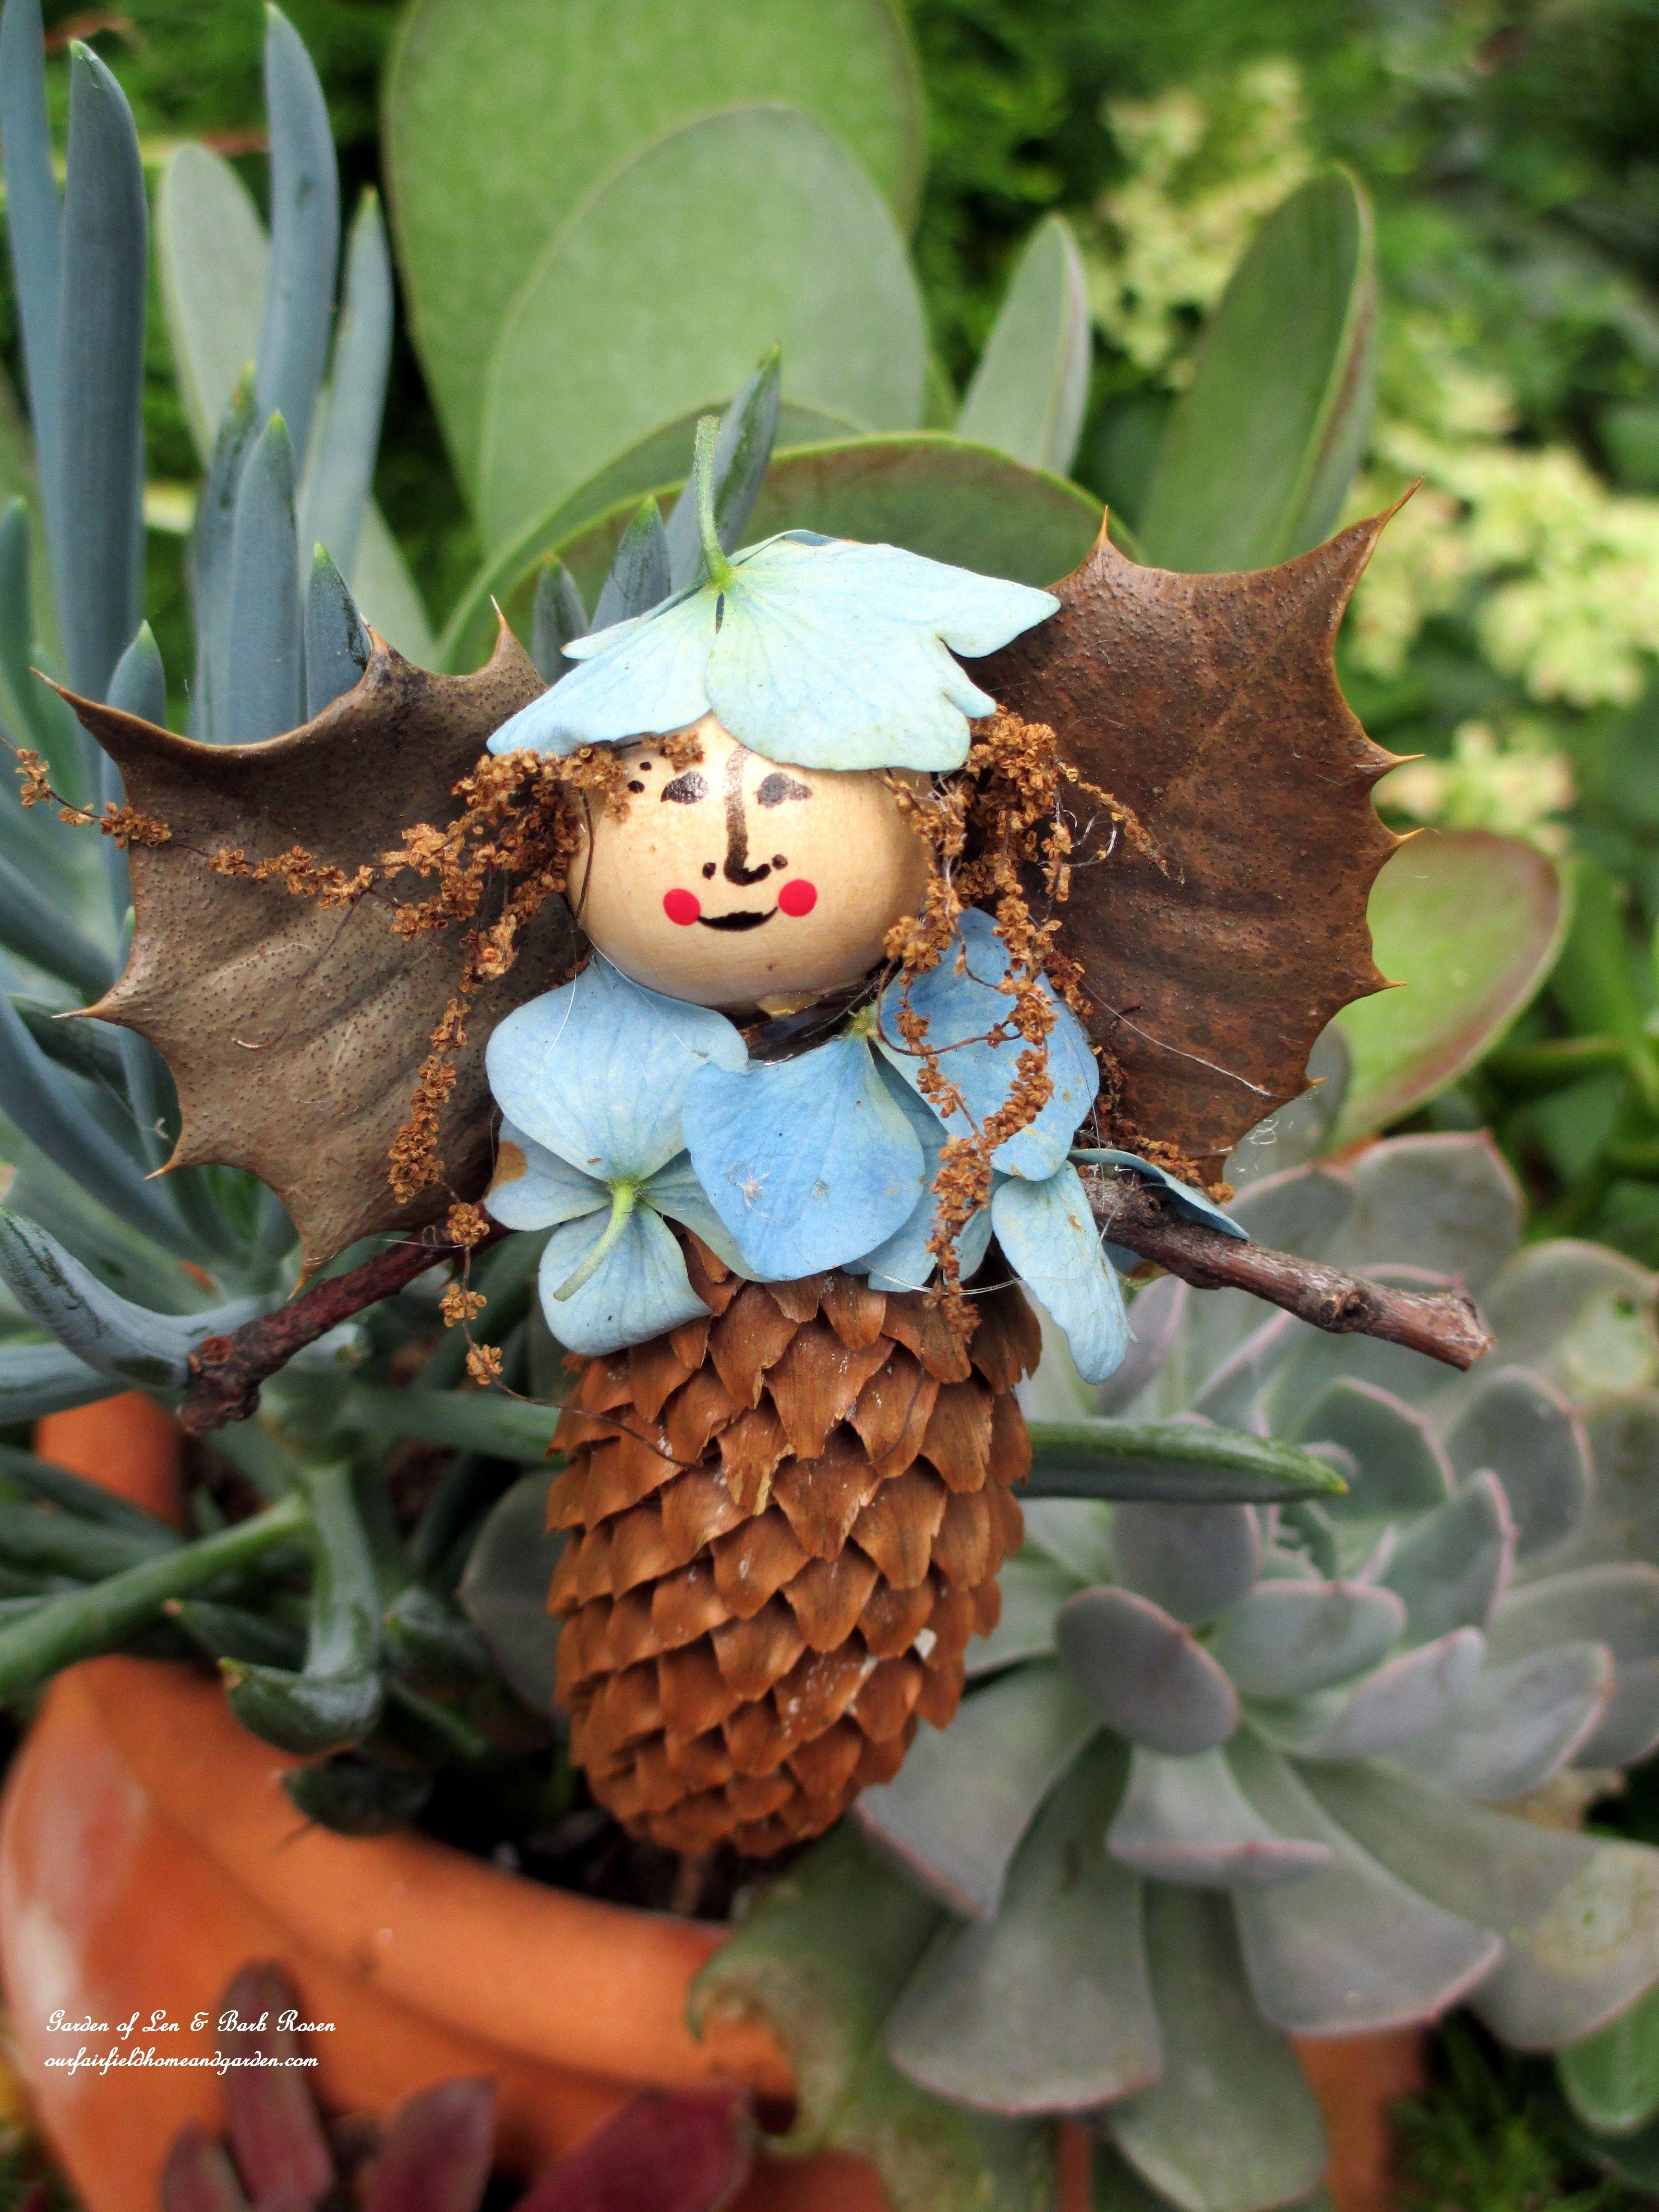 Elegant Make Your Own Garden